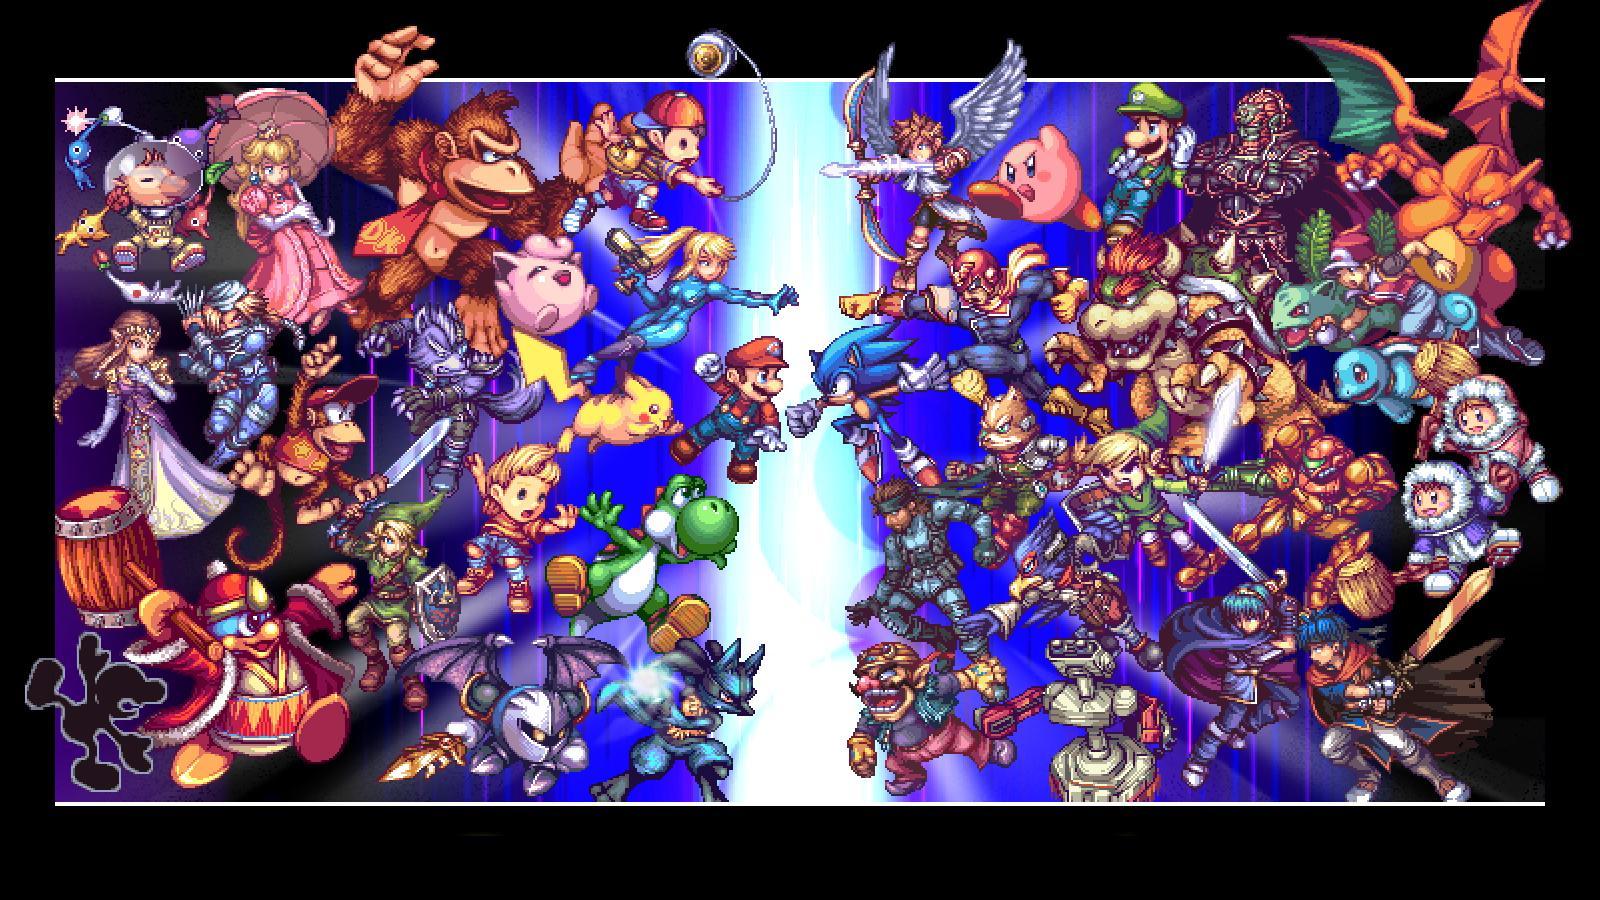 Free Download Super Smash Bros Wallpaper 1600x900 193251